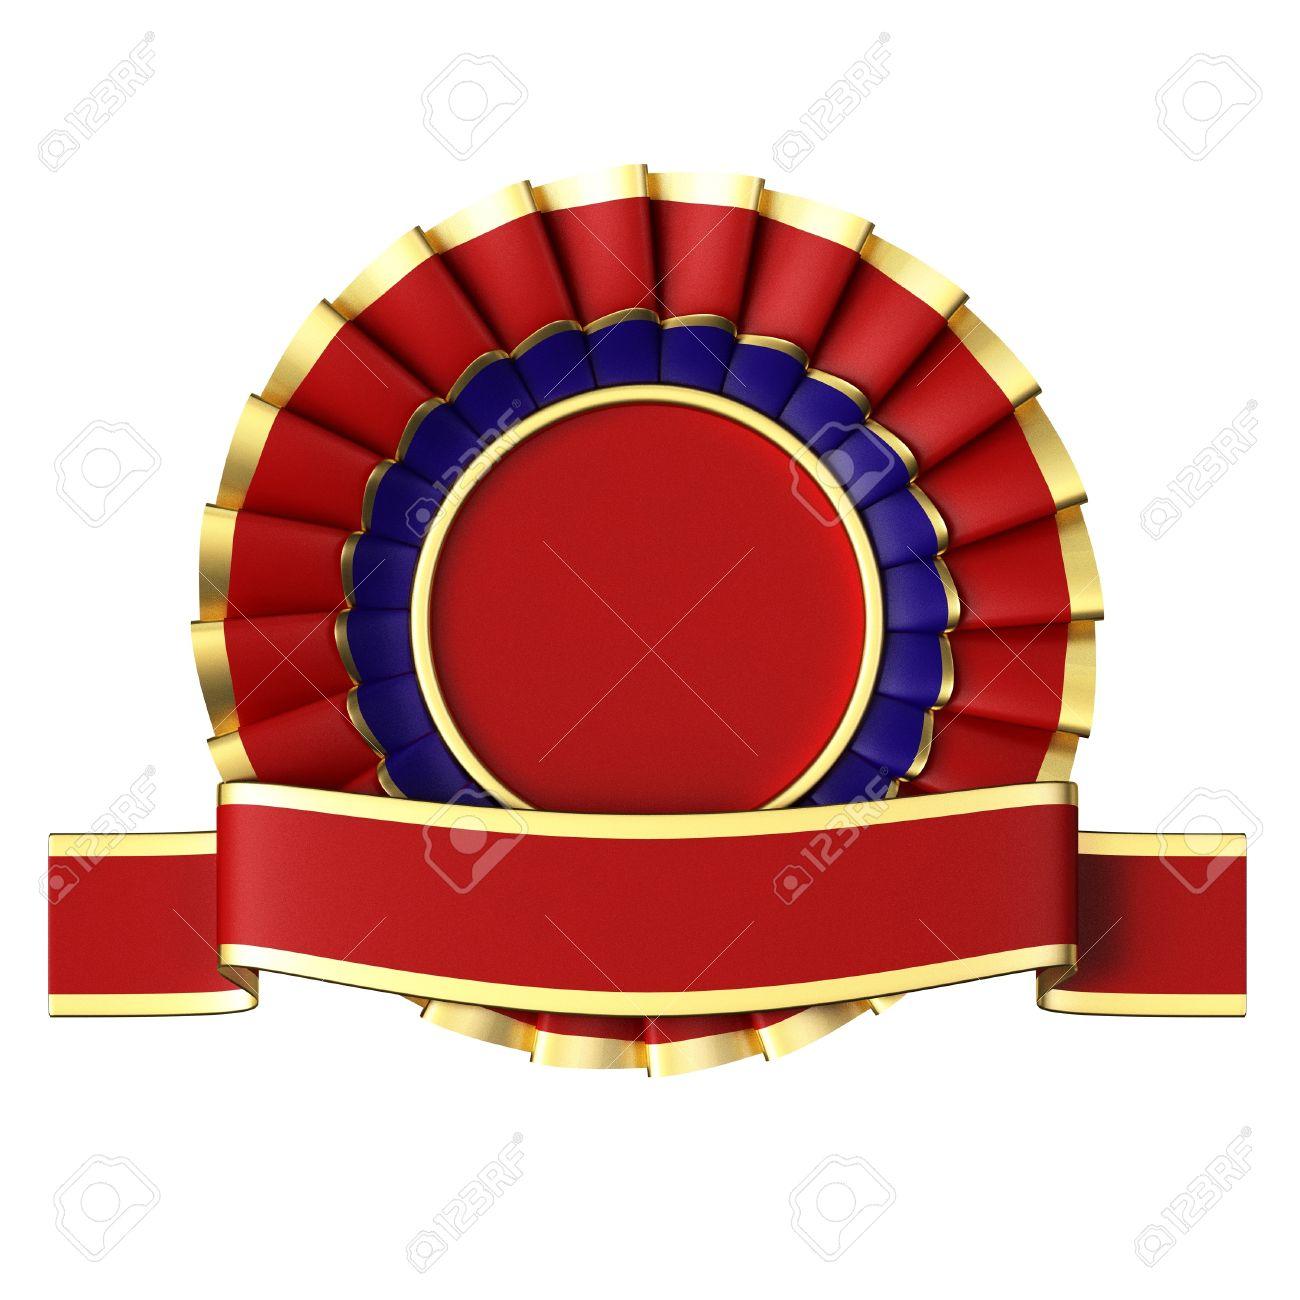 Red Ribbon Award isolated on white background. Stock Photo - 13079003